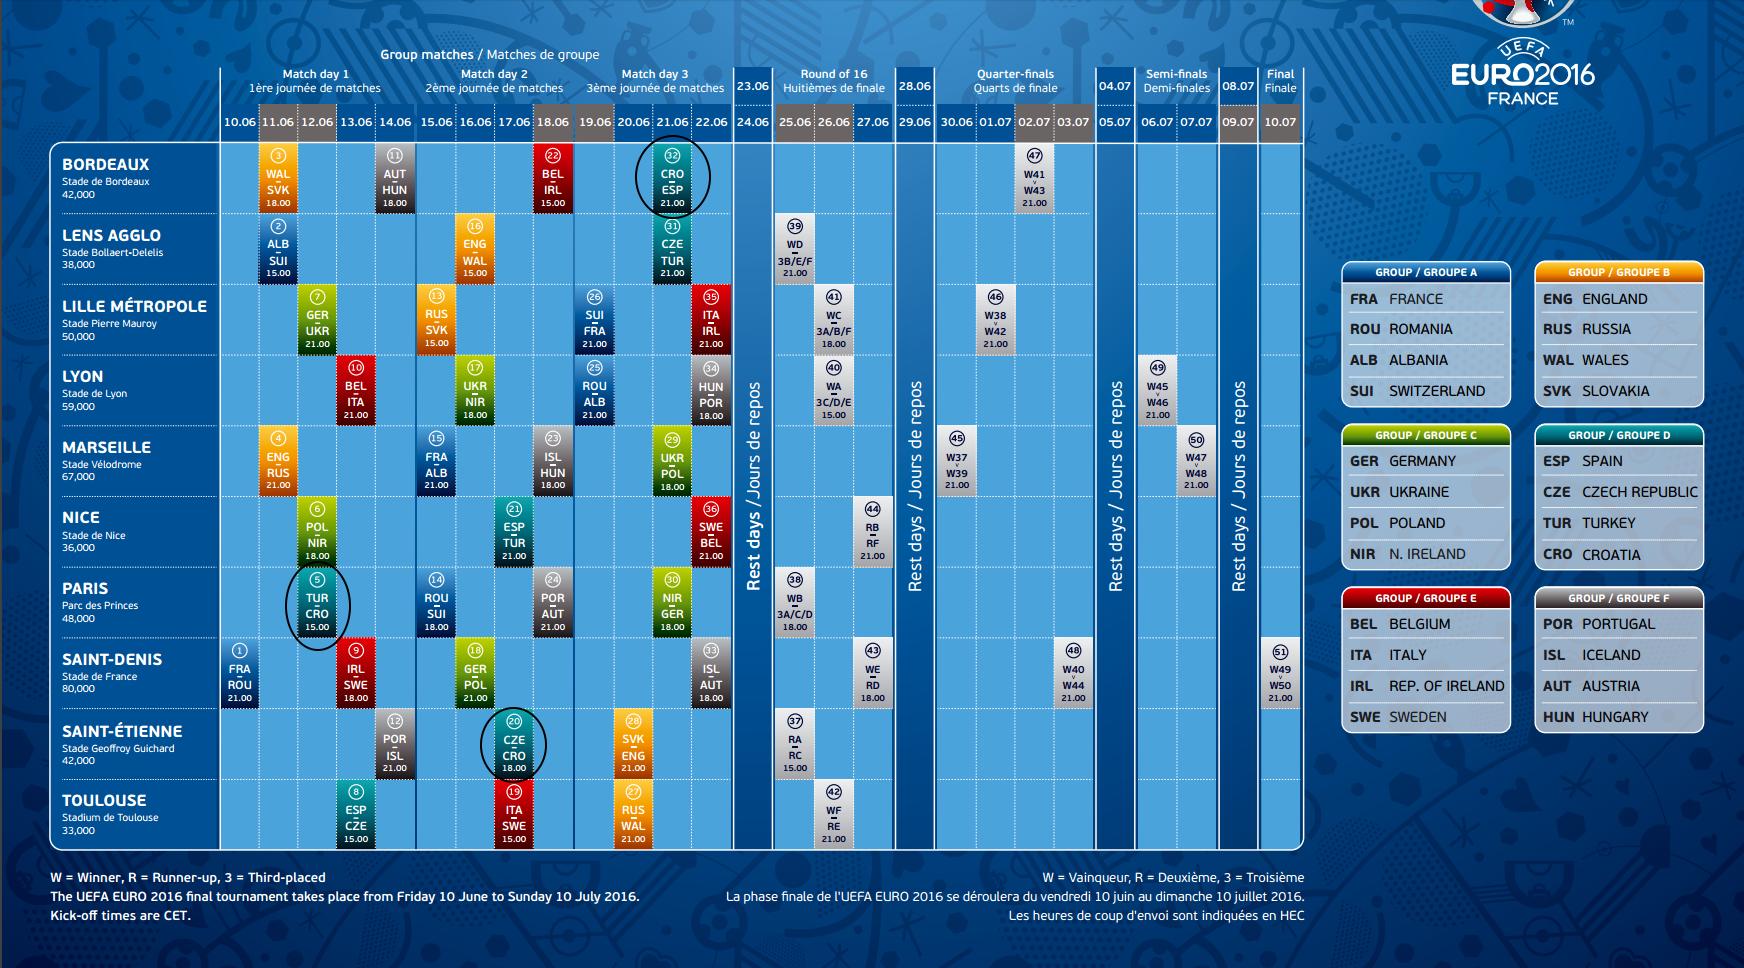 Raspored_utakmica_za_euro_2016_francuska